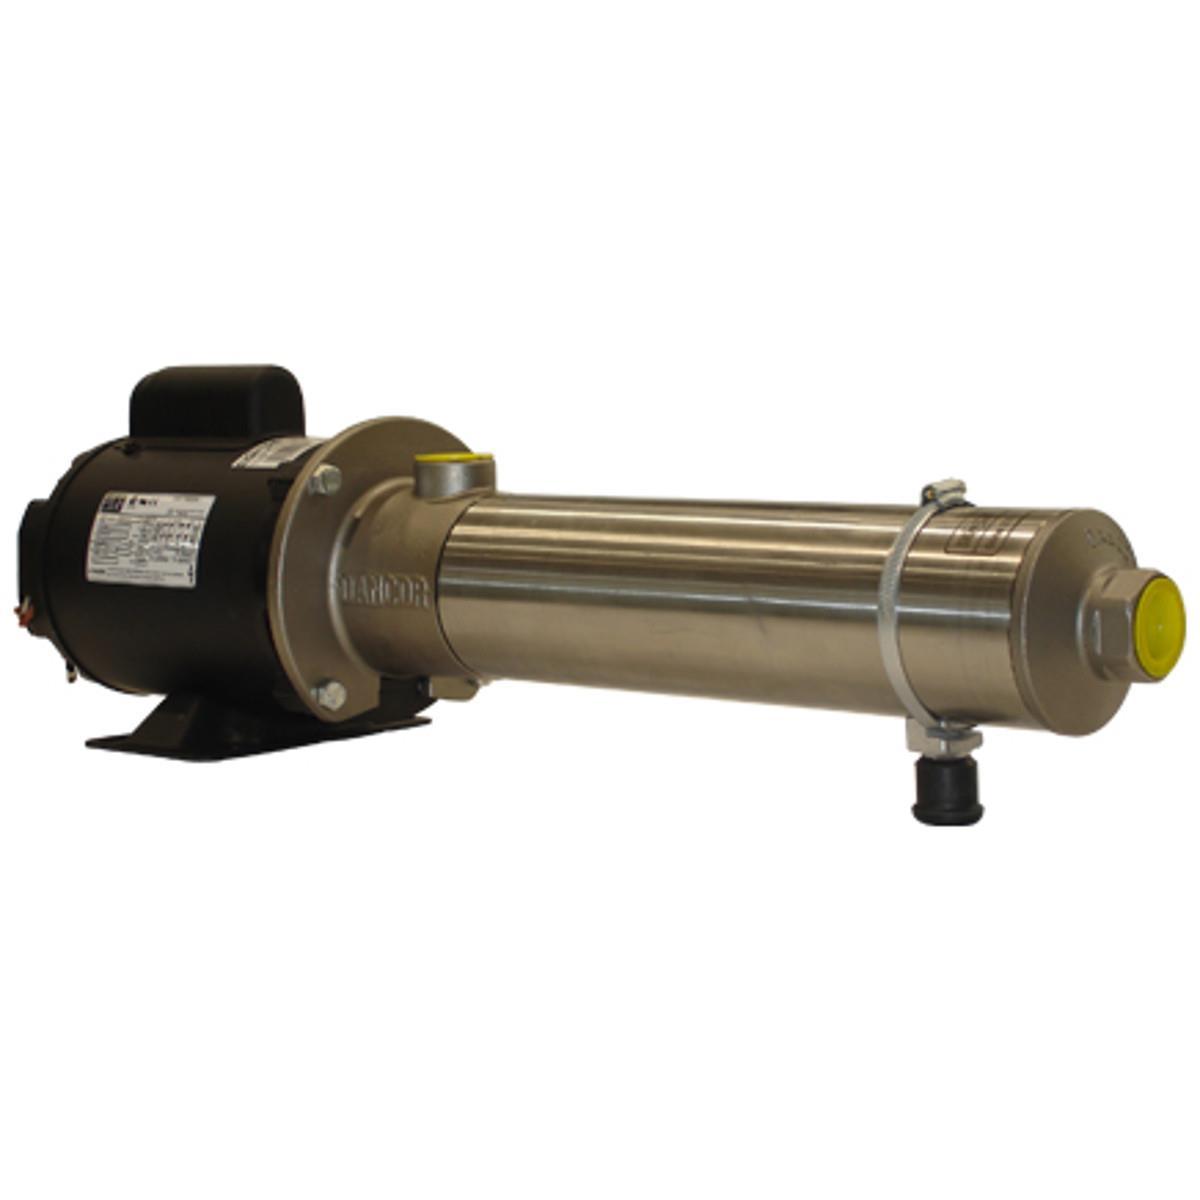 Bomba Multe estágio Dancor Booster Cap-3.2-15 B 1 1/2 Cv Trifásica 220v